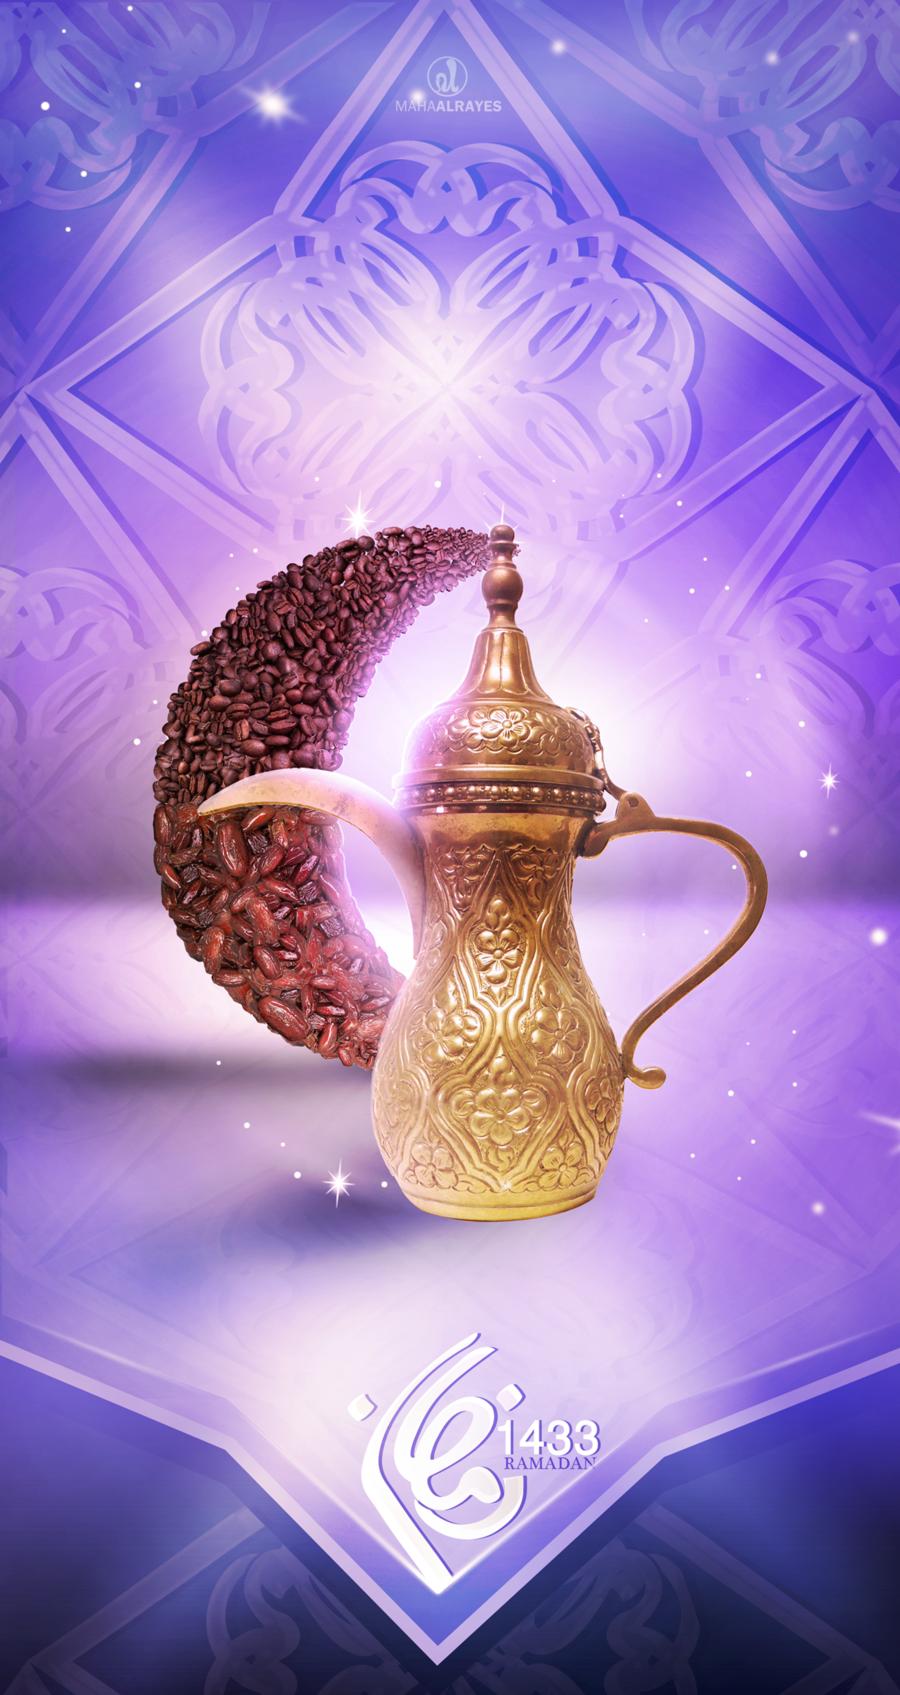 Arti Ramadhan Mubarak : ramadhan, mubarak, Ramadan, Saudi, Arabia, Designermooh, DeviantART, Arabia,, Muslim, Ramadan,, Kareem